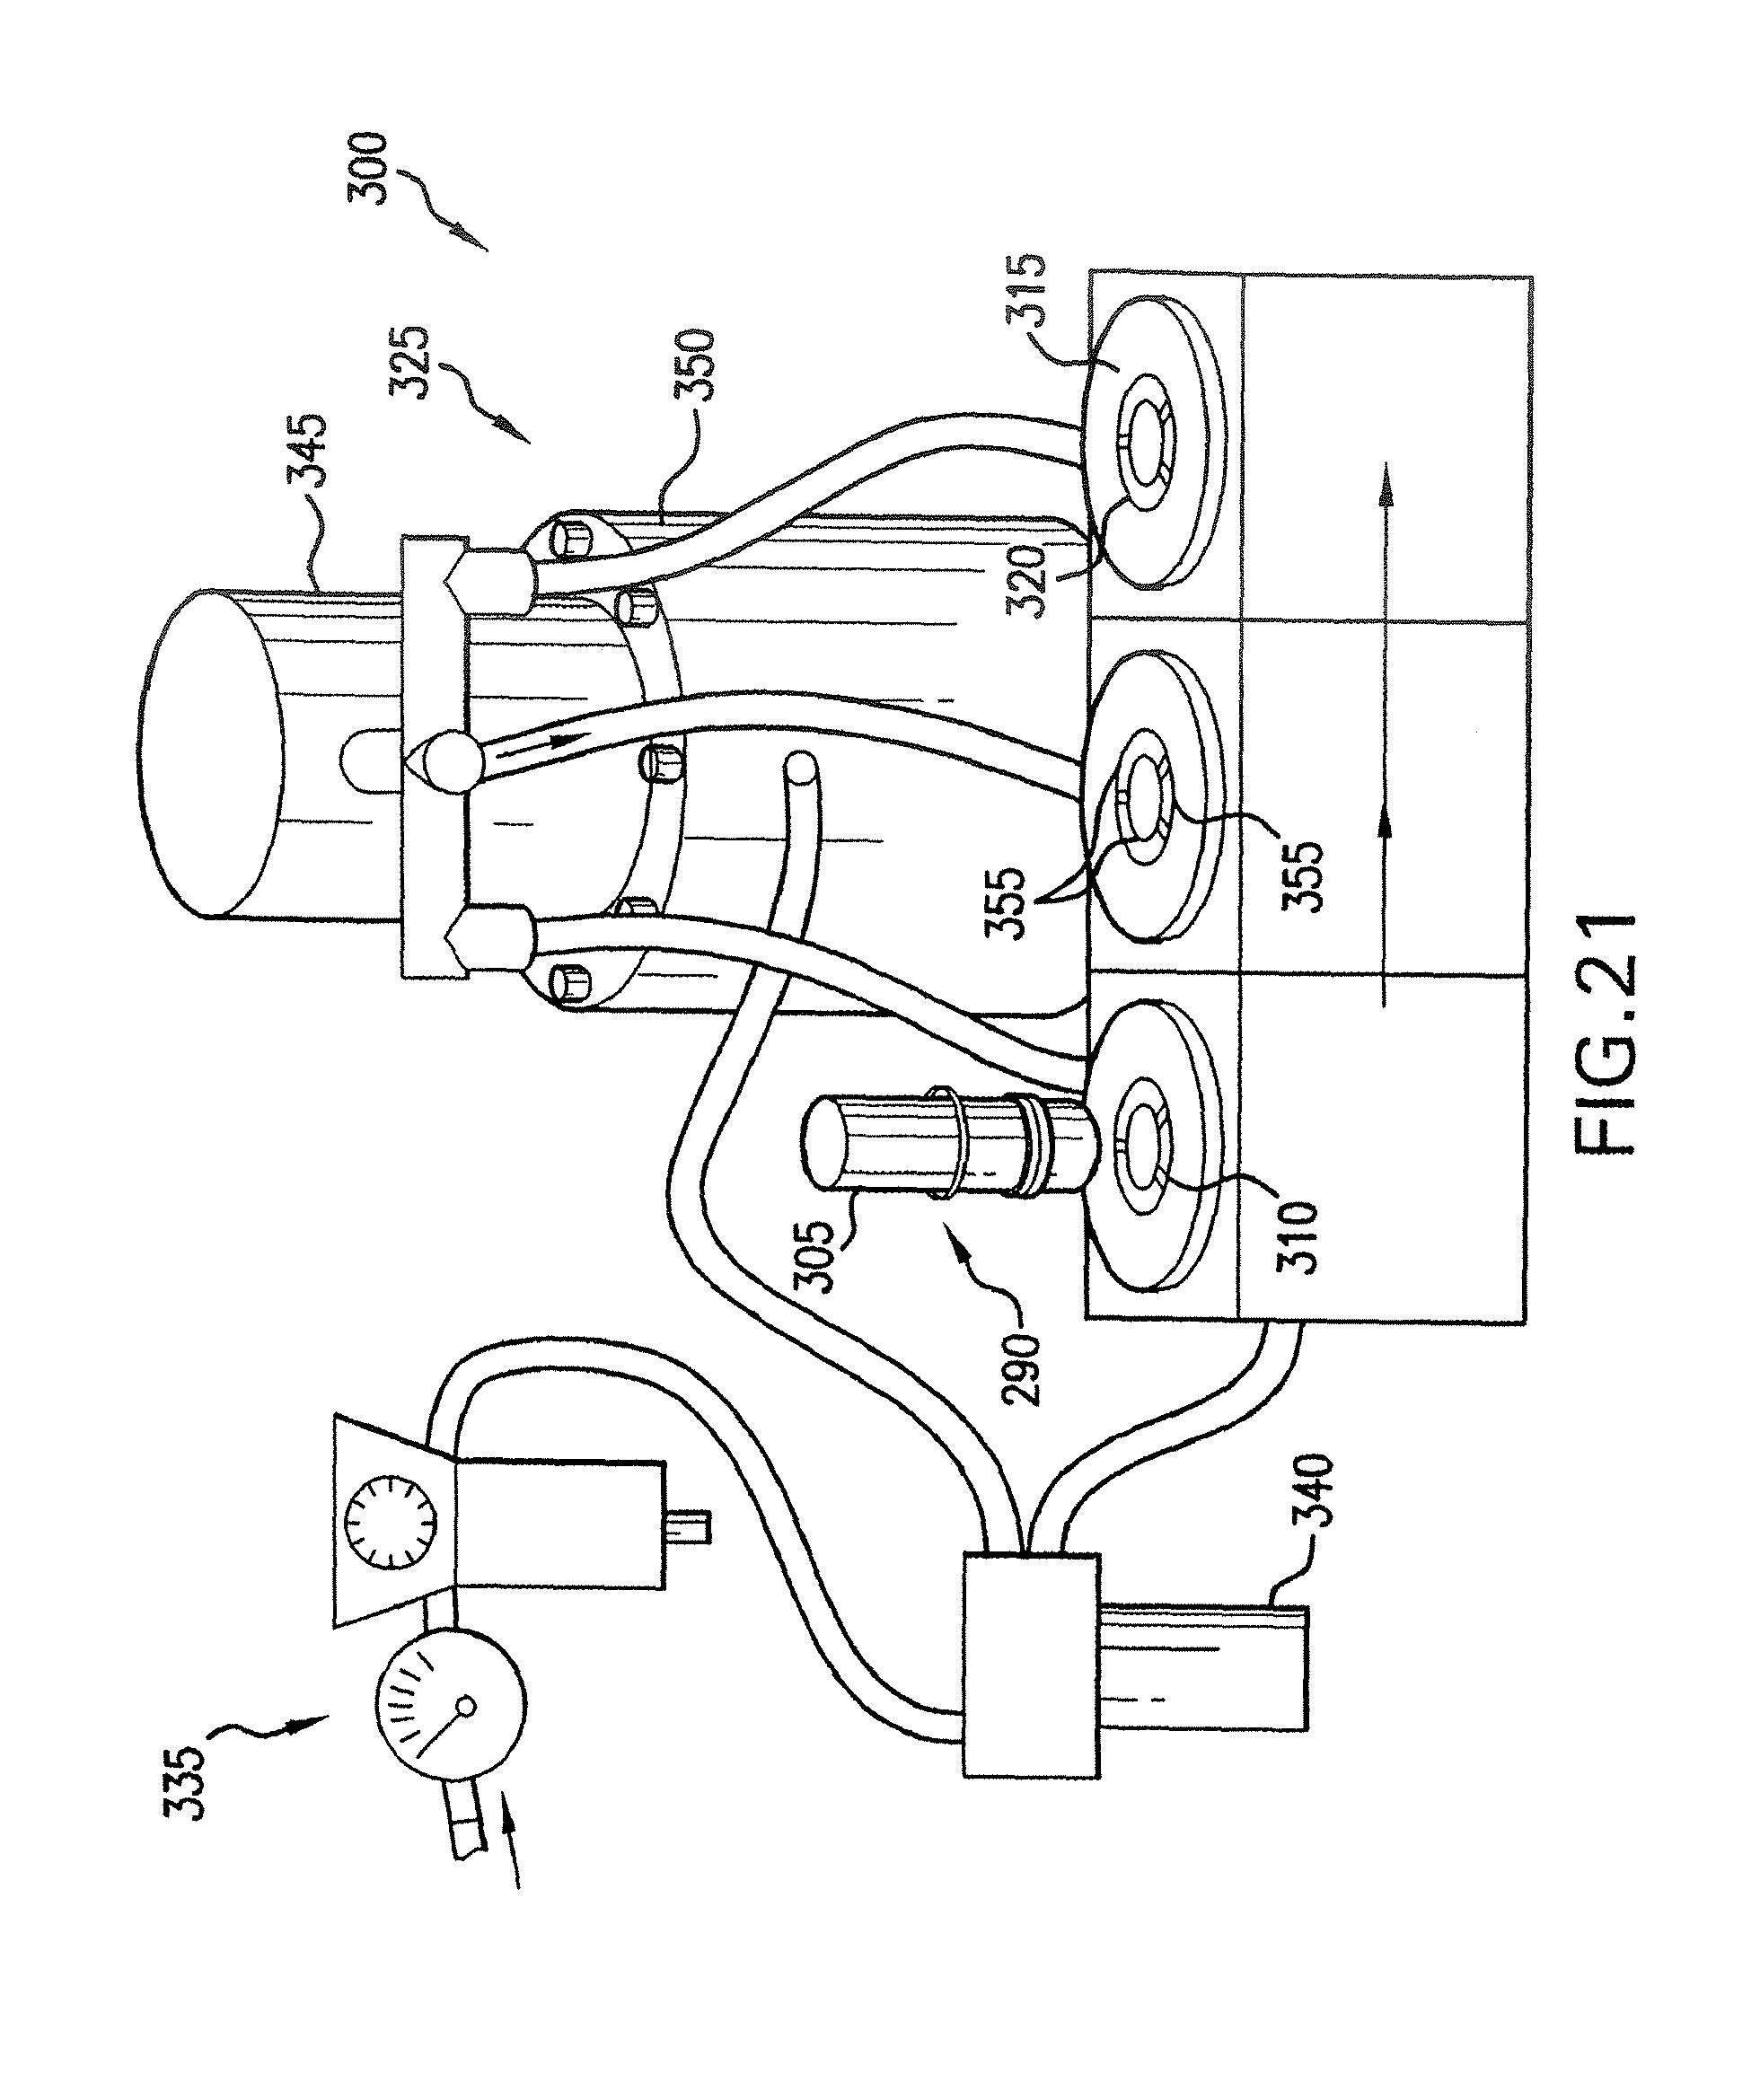 Iridium Wedding Band 46 Trend Patent Drawing